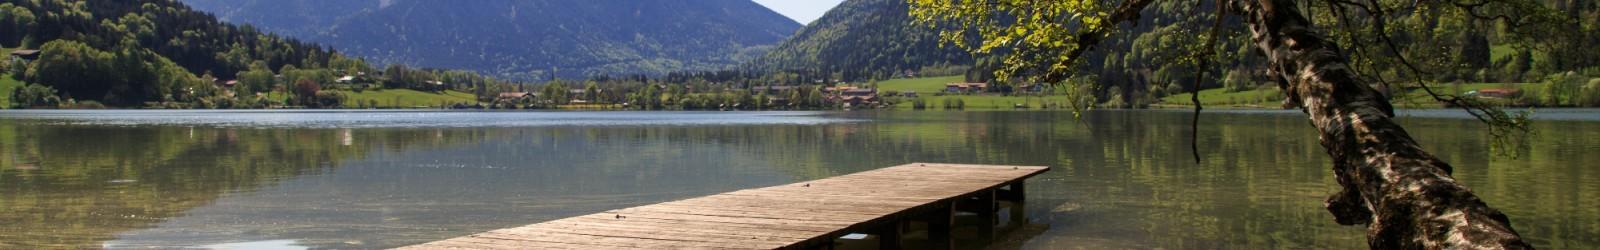 Kurzurlaub Oberbayern nahe Schliersee